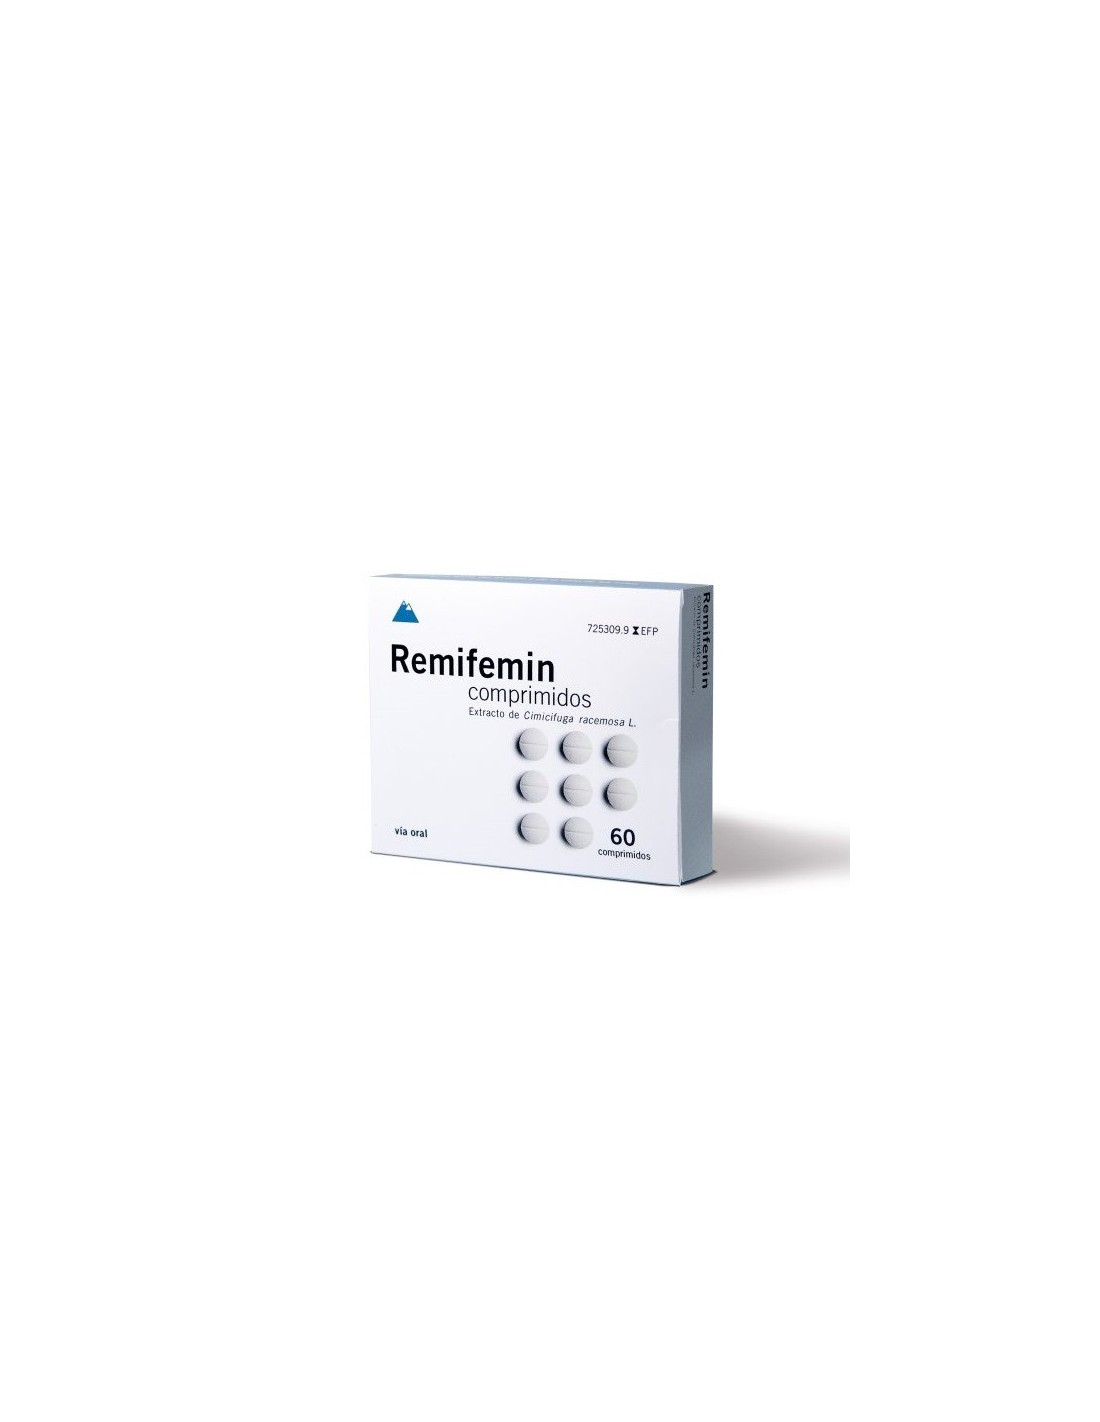 REMIFEMIN 20 MG 60 COMPRIMIDOS